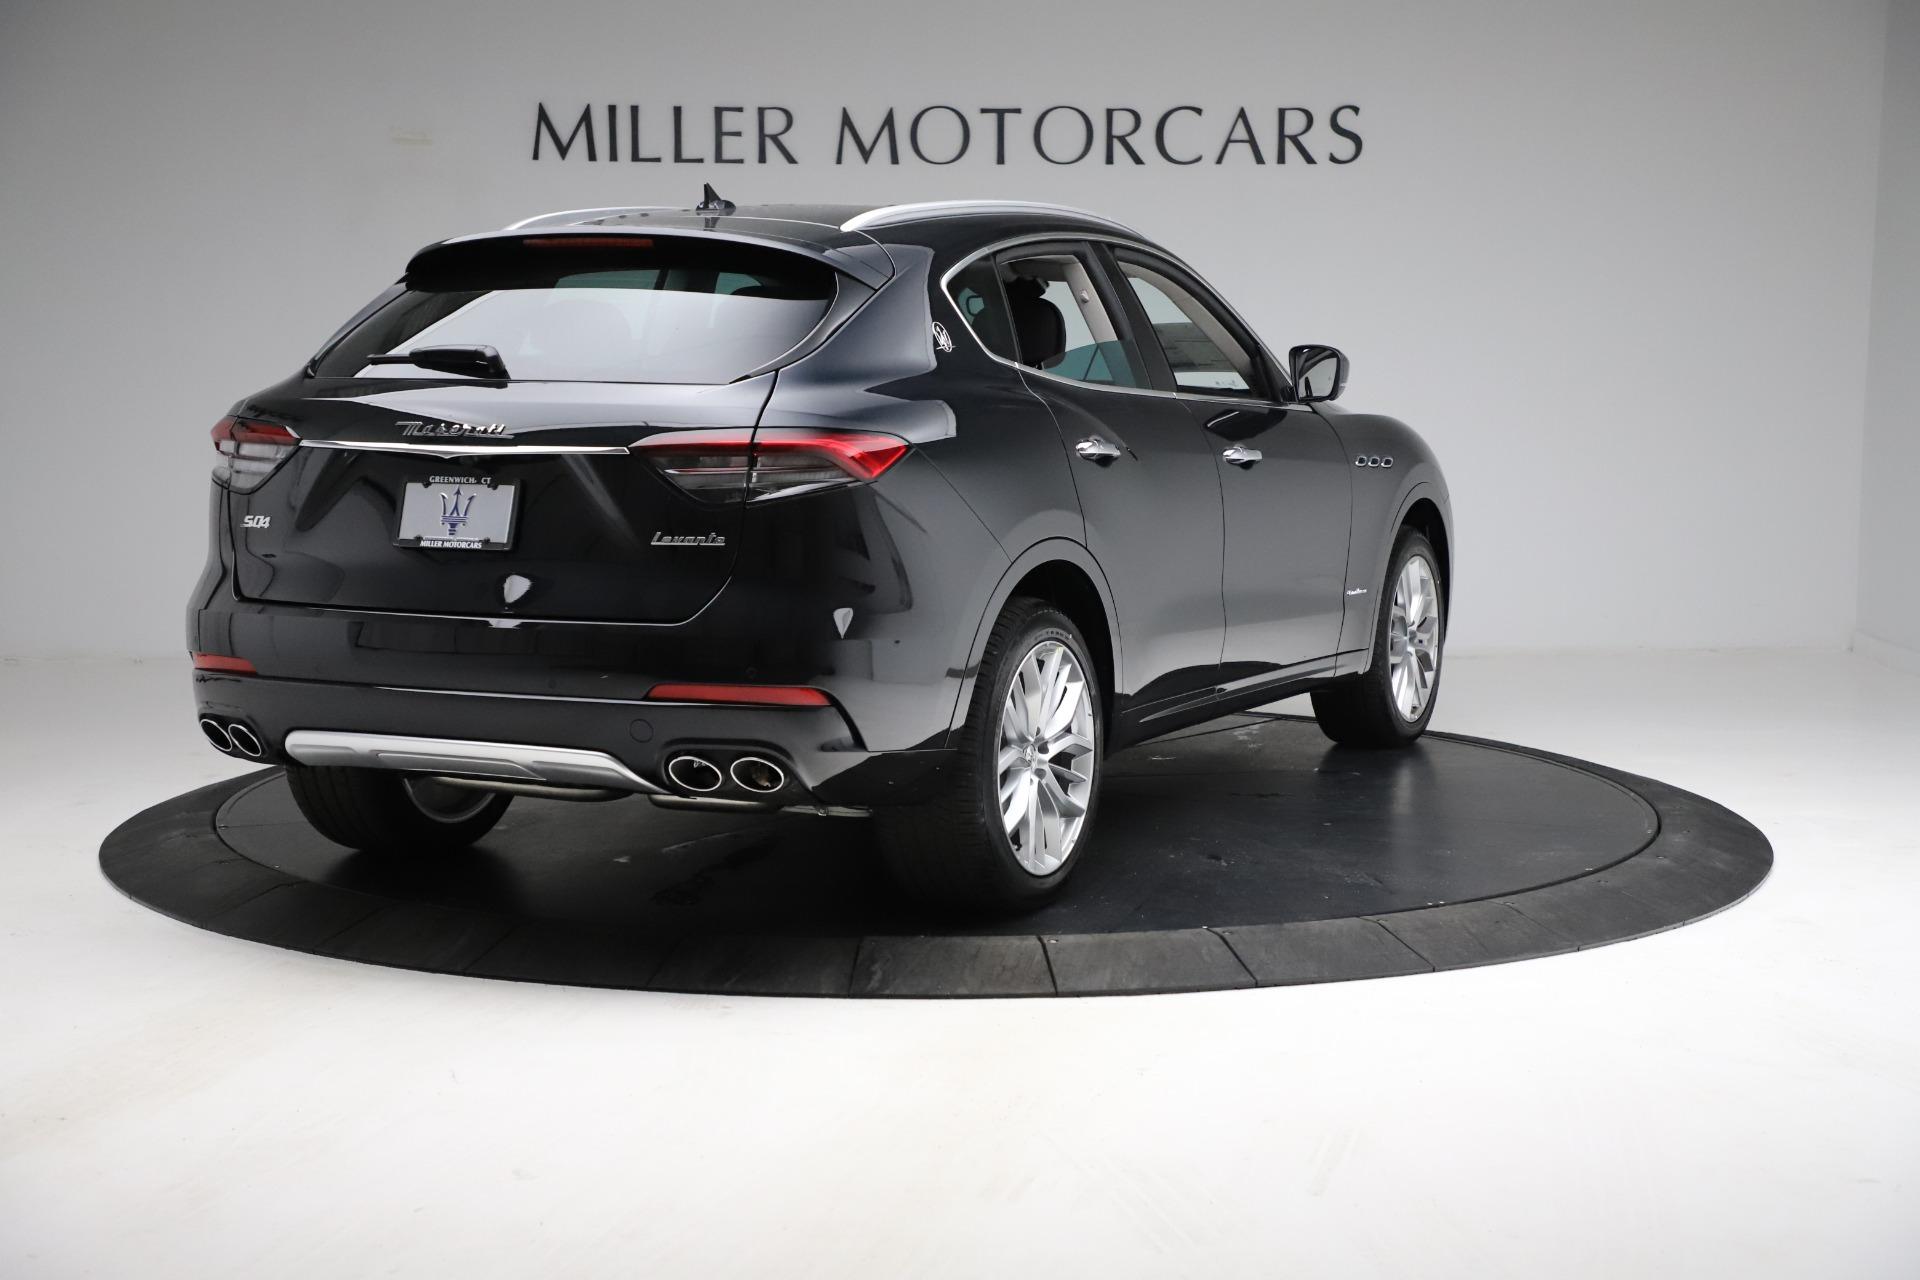 New-2021-Maserati-Levante-S-Q4-GranLusso